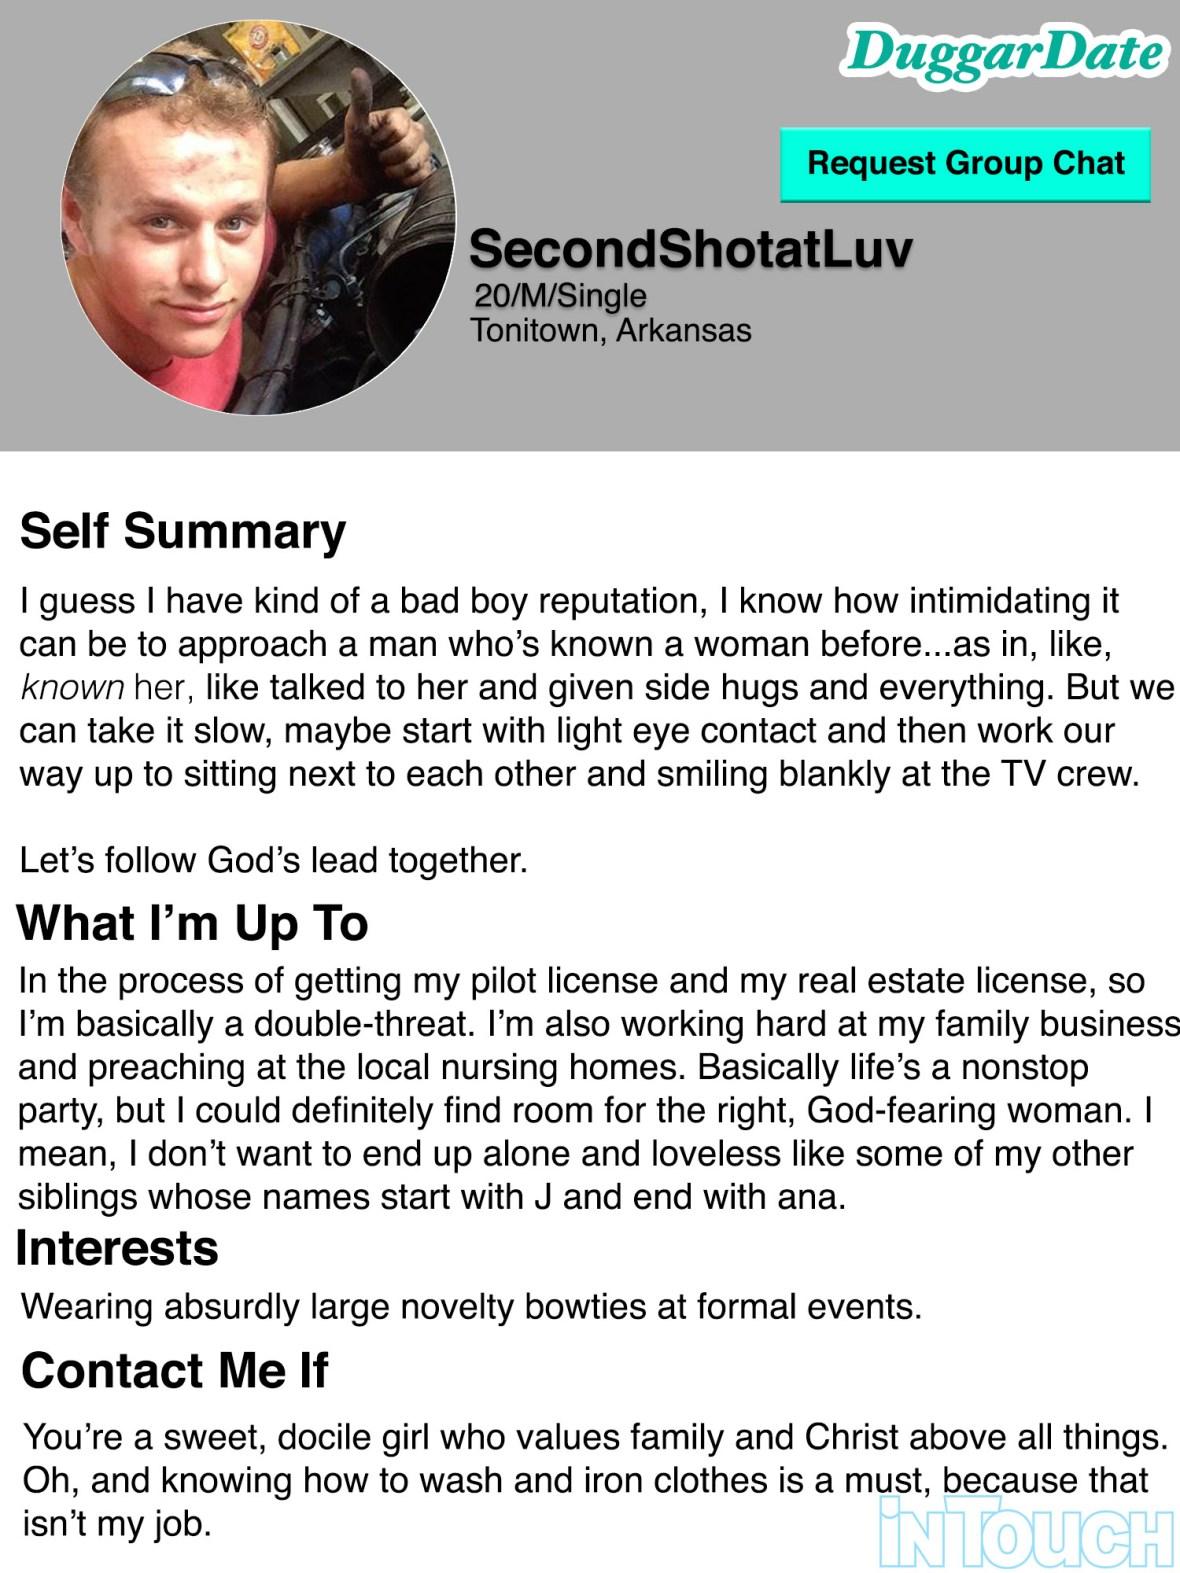 josiah duggar dating profile